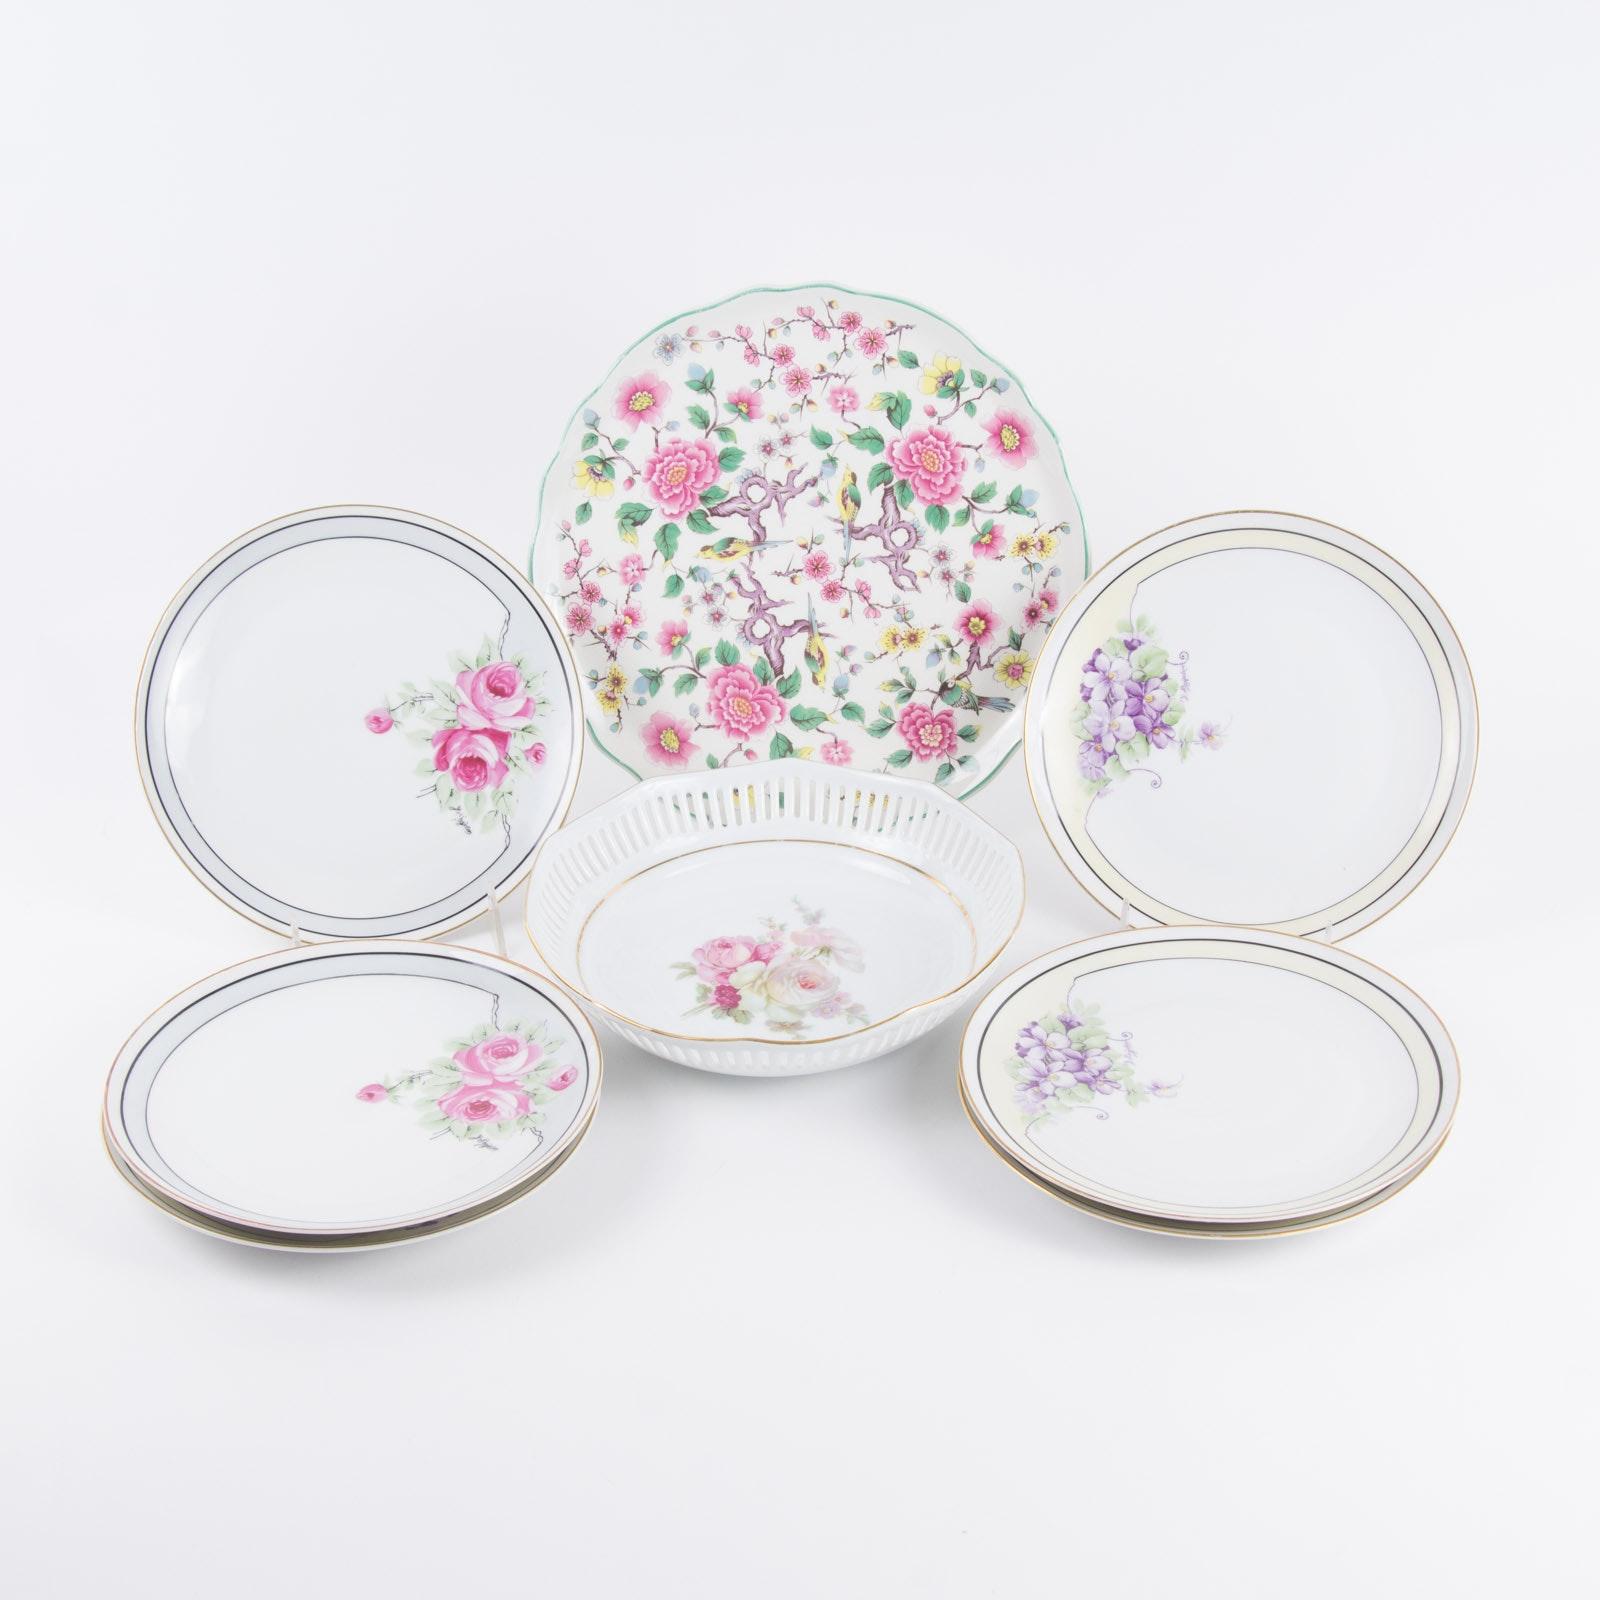 Floral Theme Tableware Set